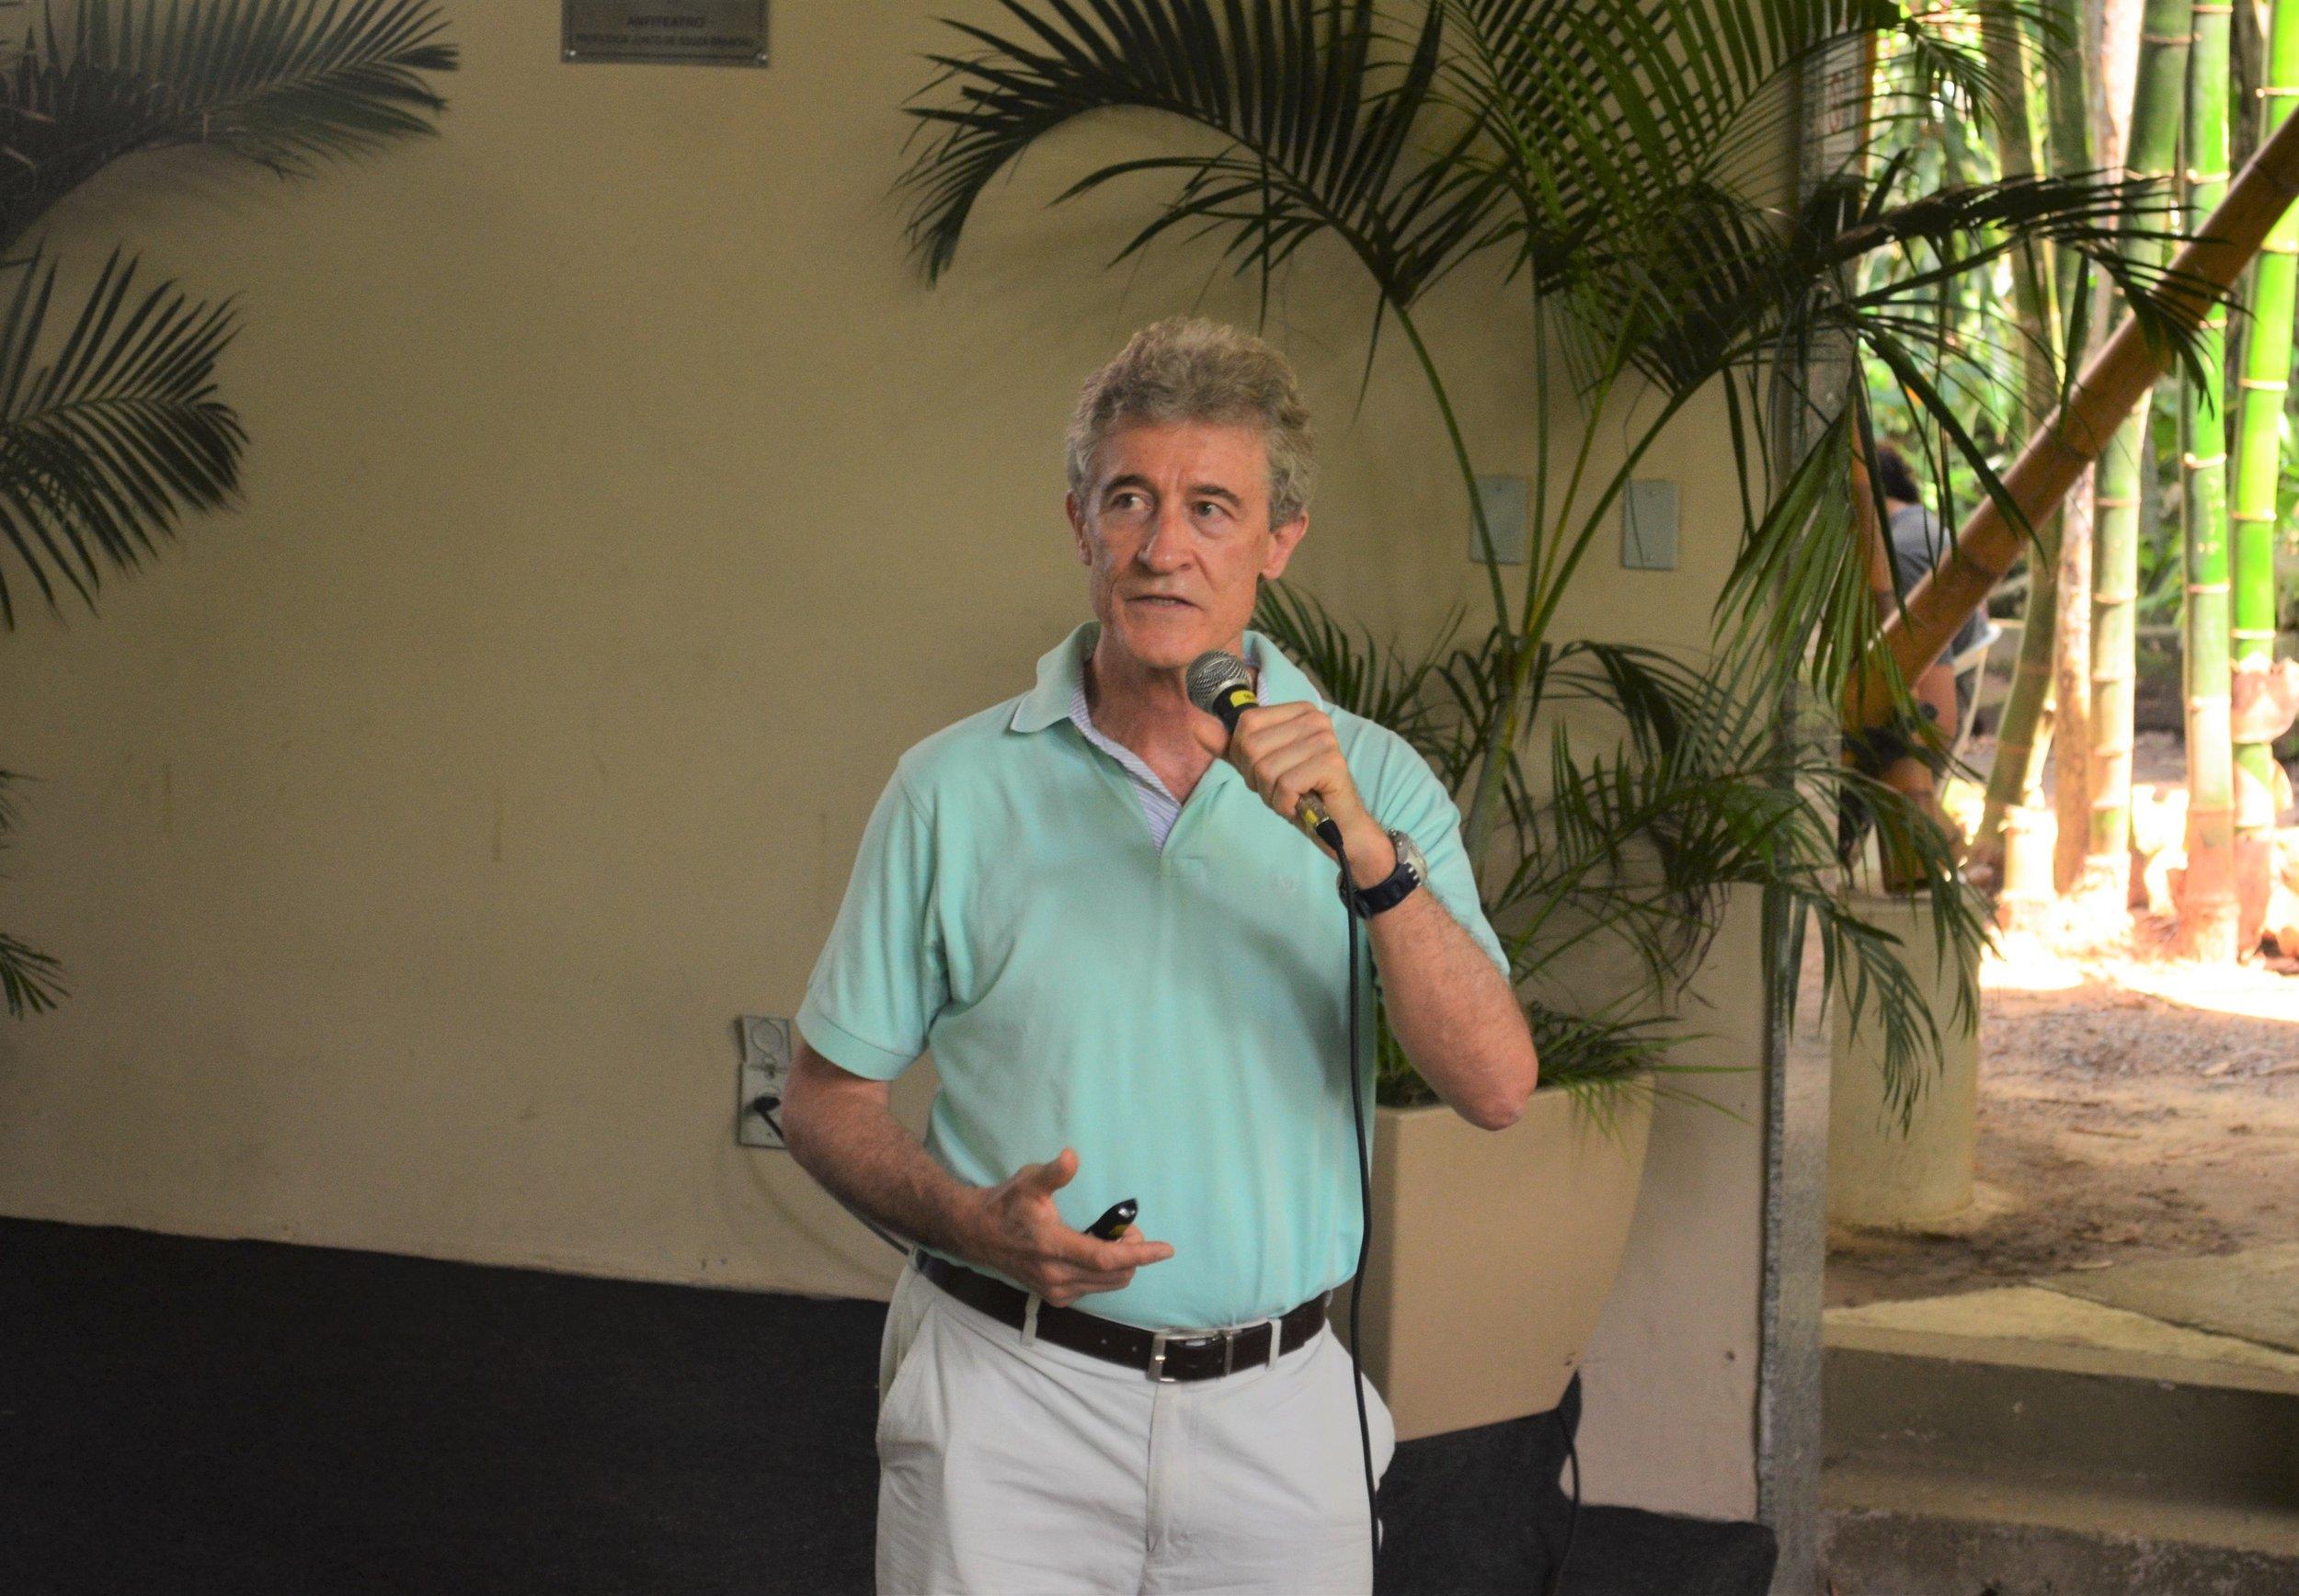 Professor Jorge Biolchini, coordenador do curso de Plenitude Mental (Mindfulness), do Departamento de Medicina da PUC-Rio.